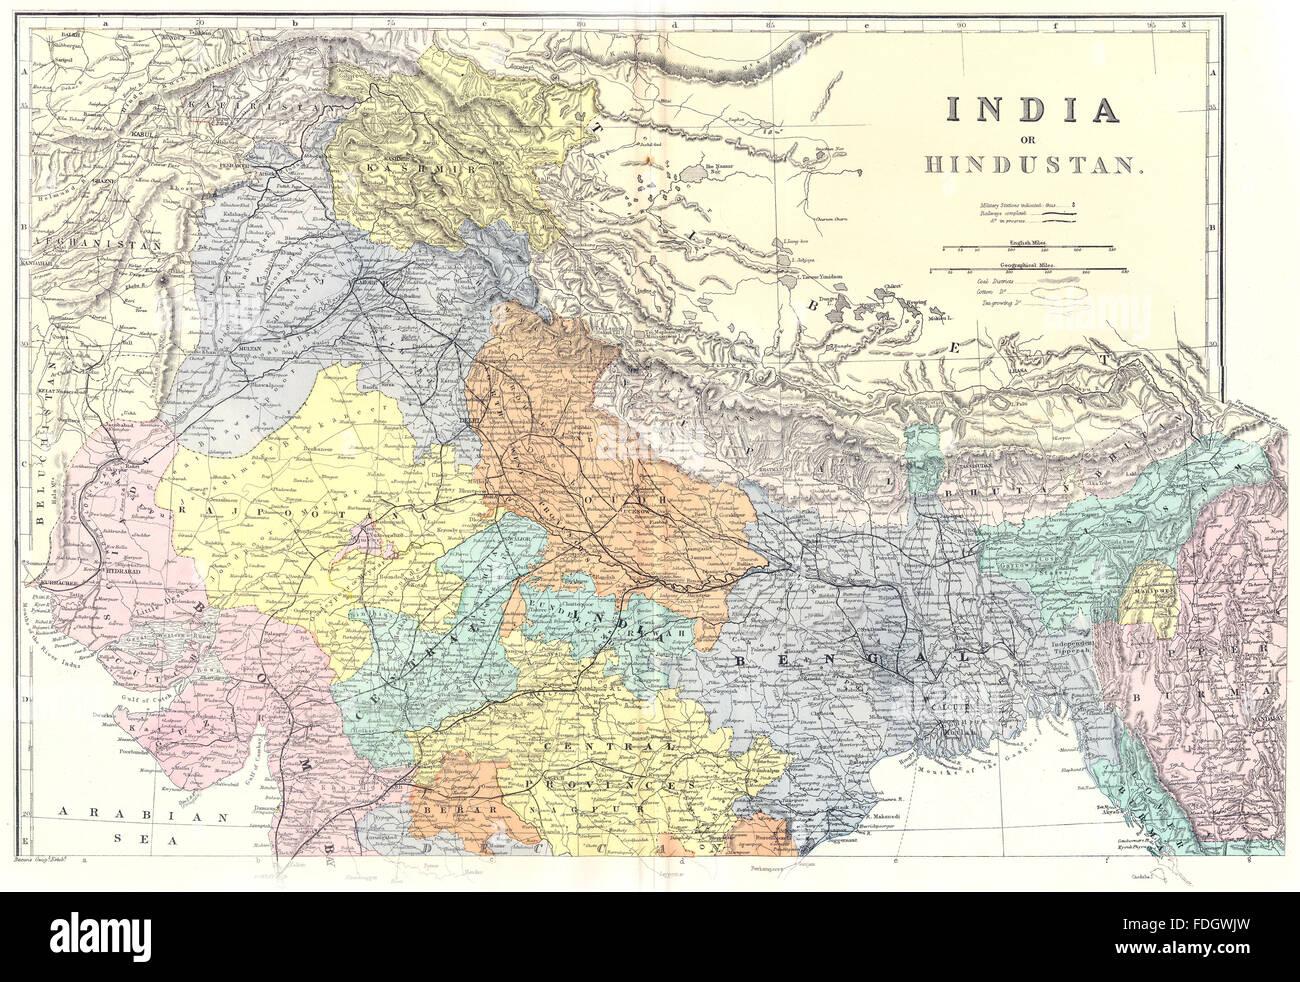 INDIA North sheet: Hindustan. Bacon, 1895 antique map - Stock Image